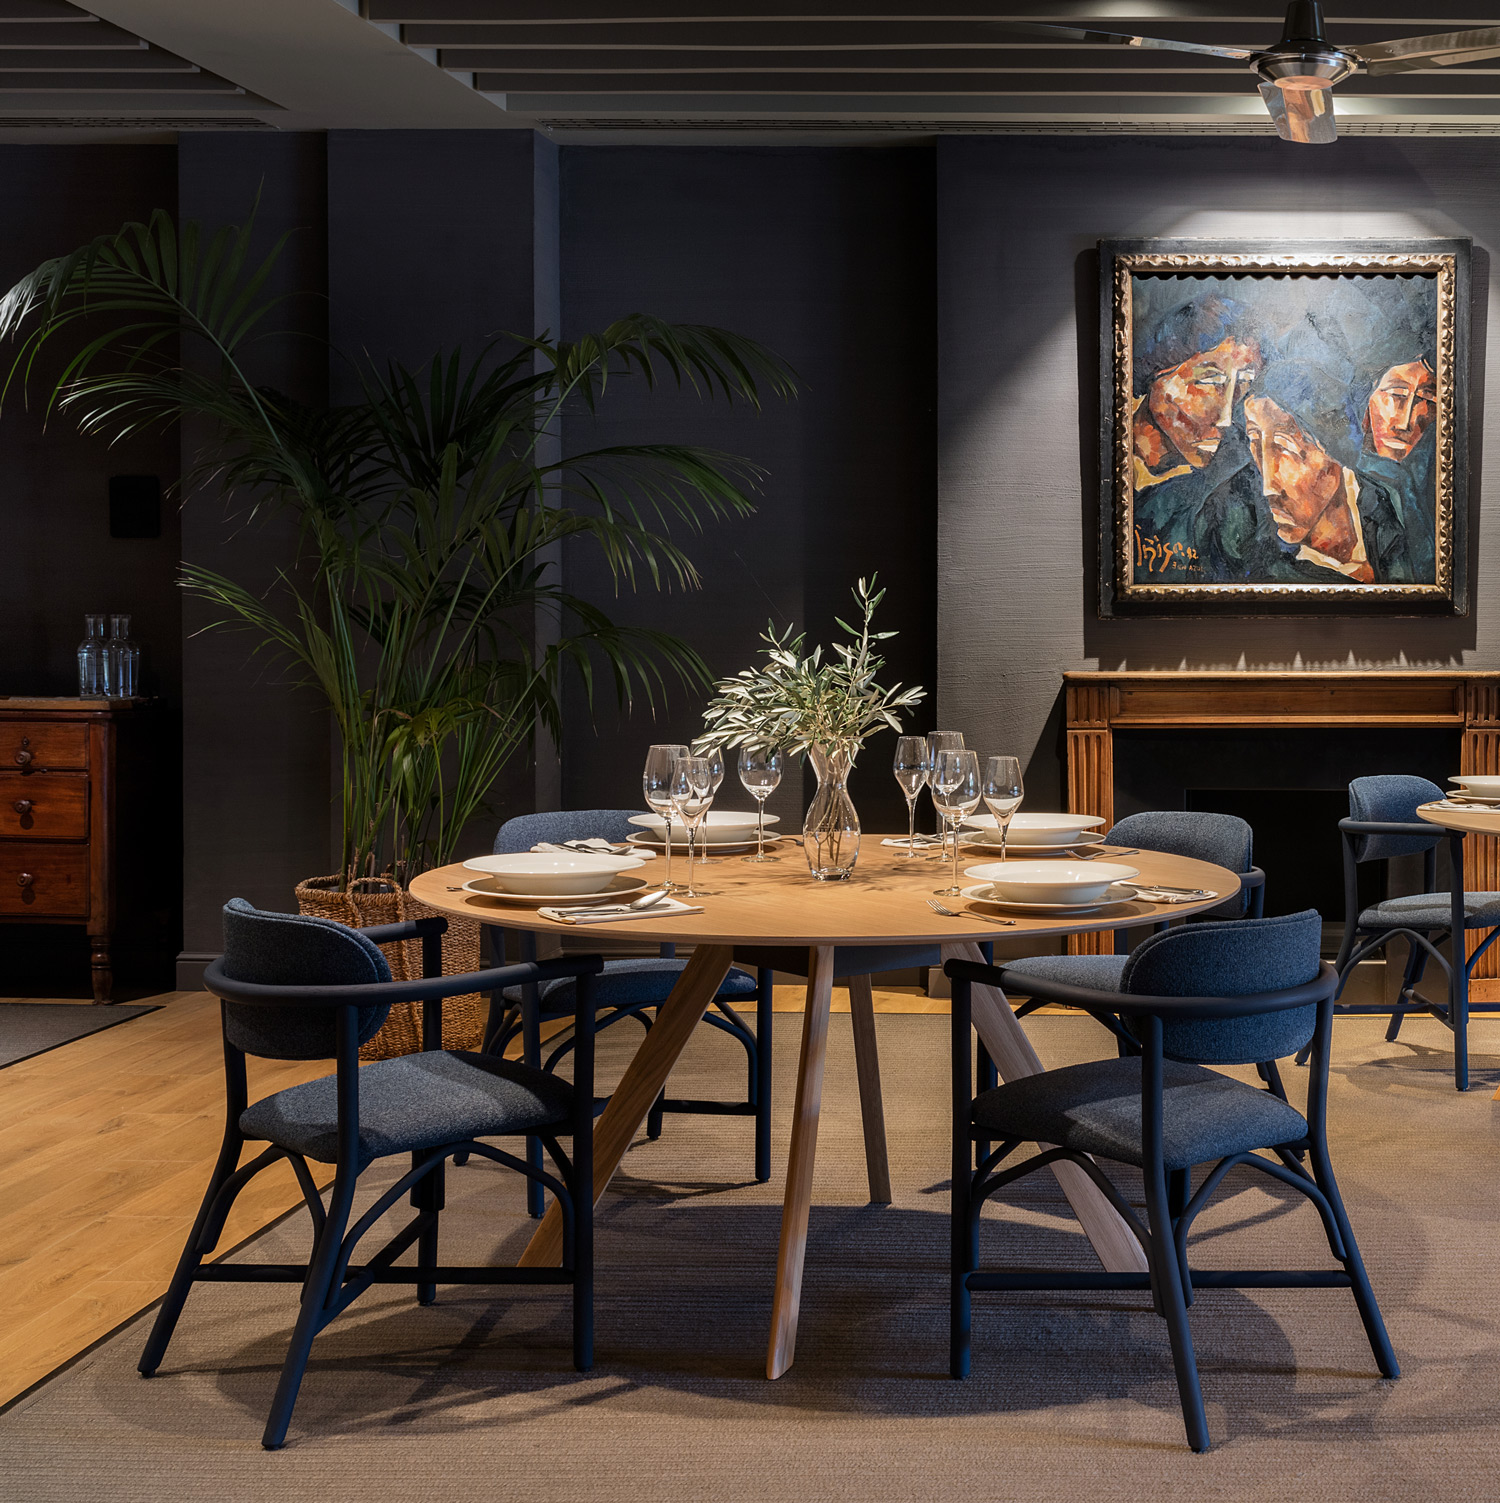 atrivm-dining-table-manel-molina-expormim-handmade-furniture-indoor-07